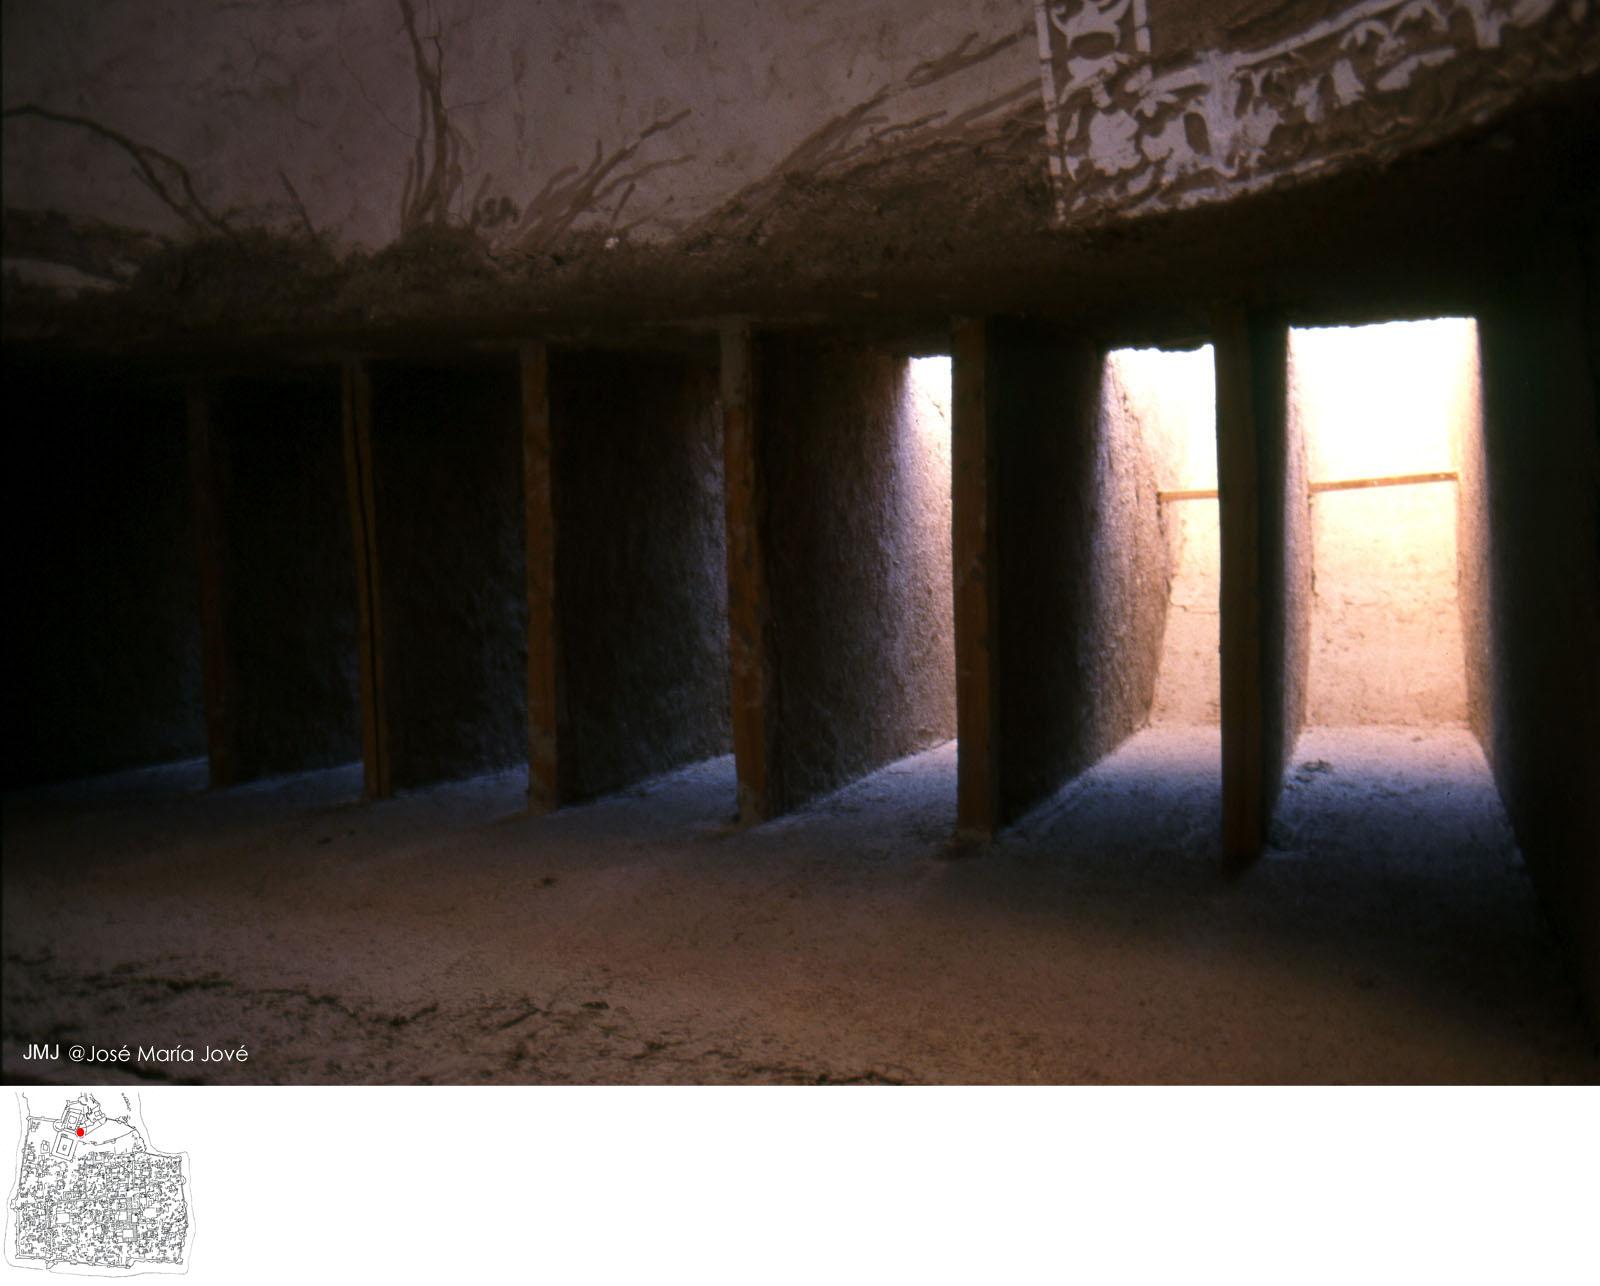 danielvillalobos-architecturalexhibition-bam-architectureofmud-28